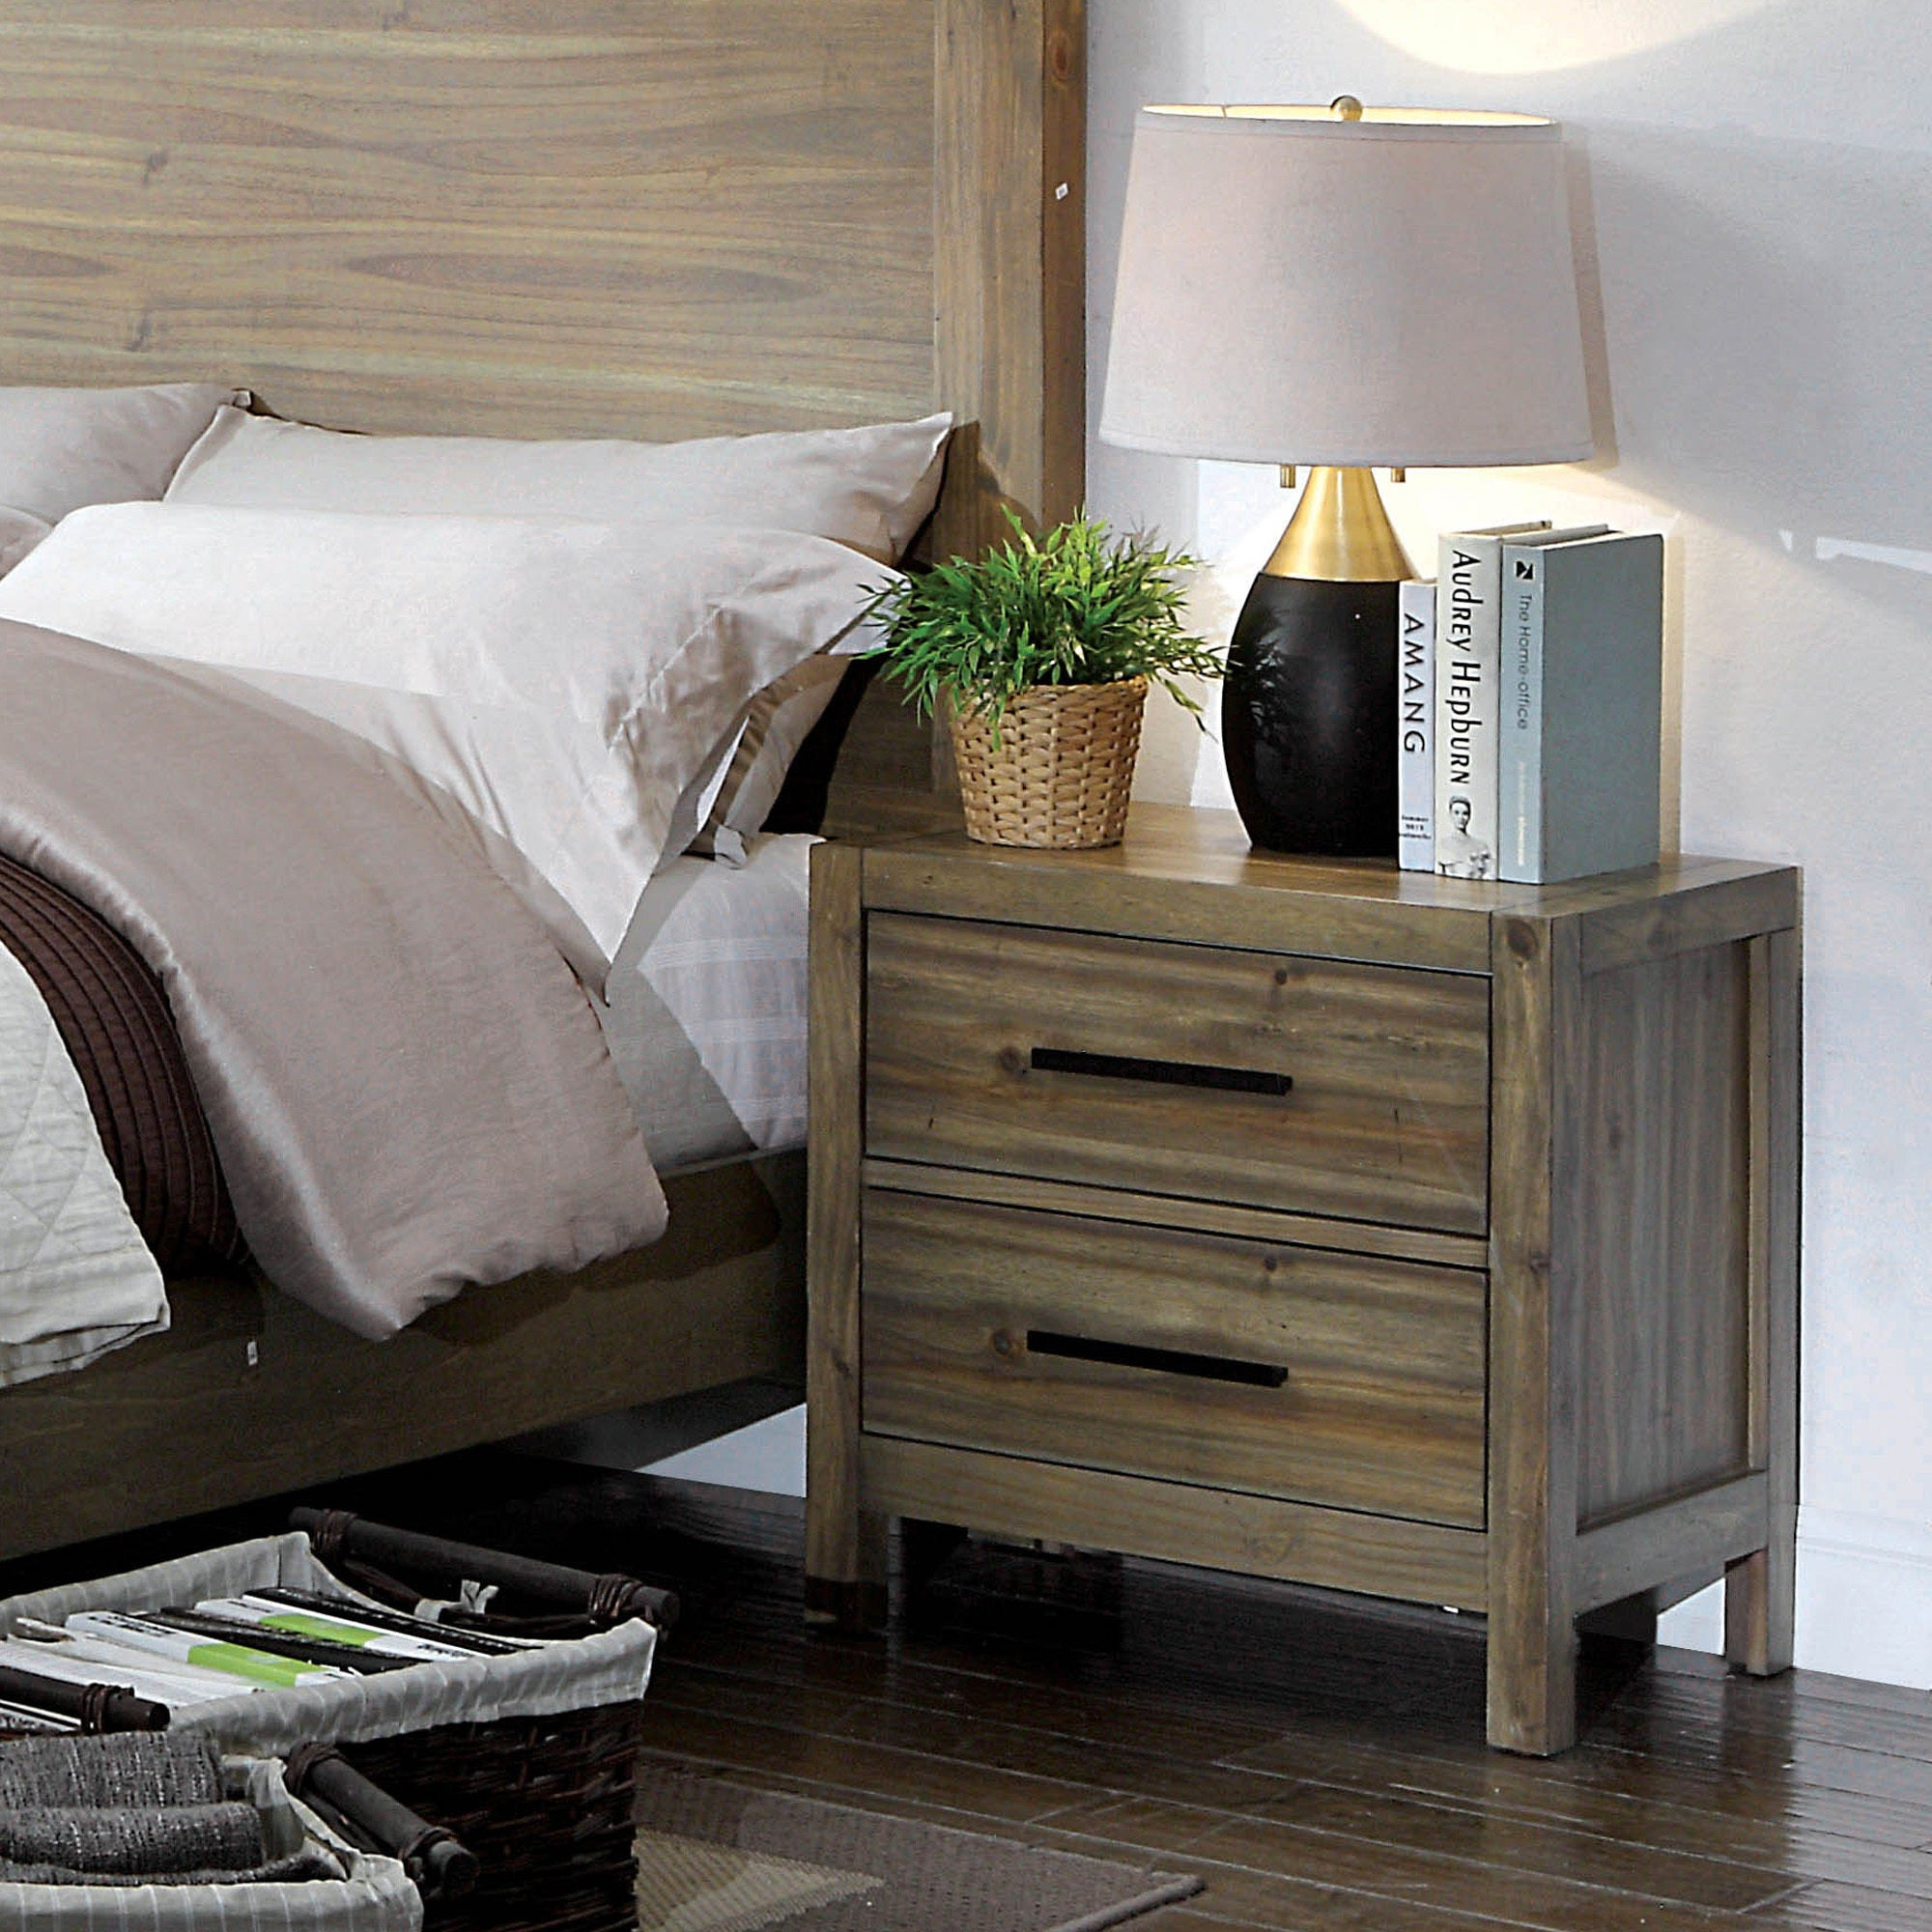 Furniture of america holstead rustic light oak 2 drawer nightstand